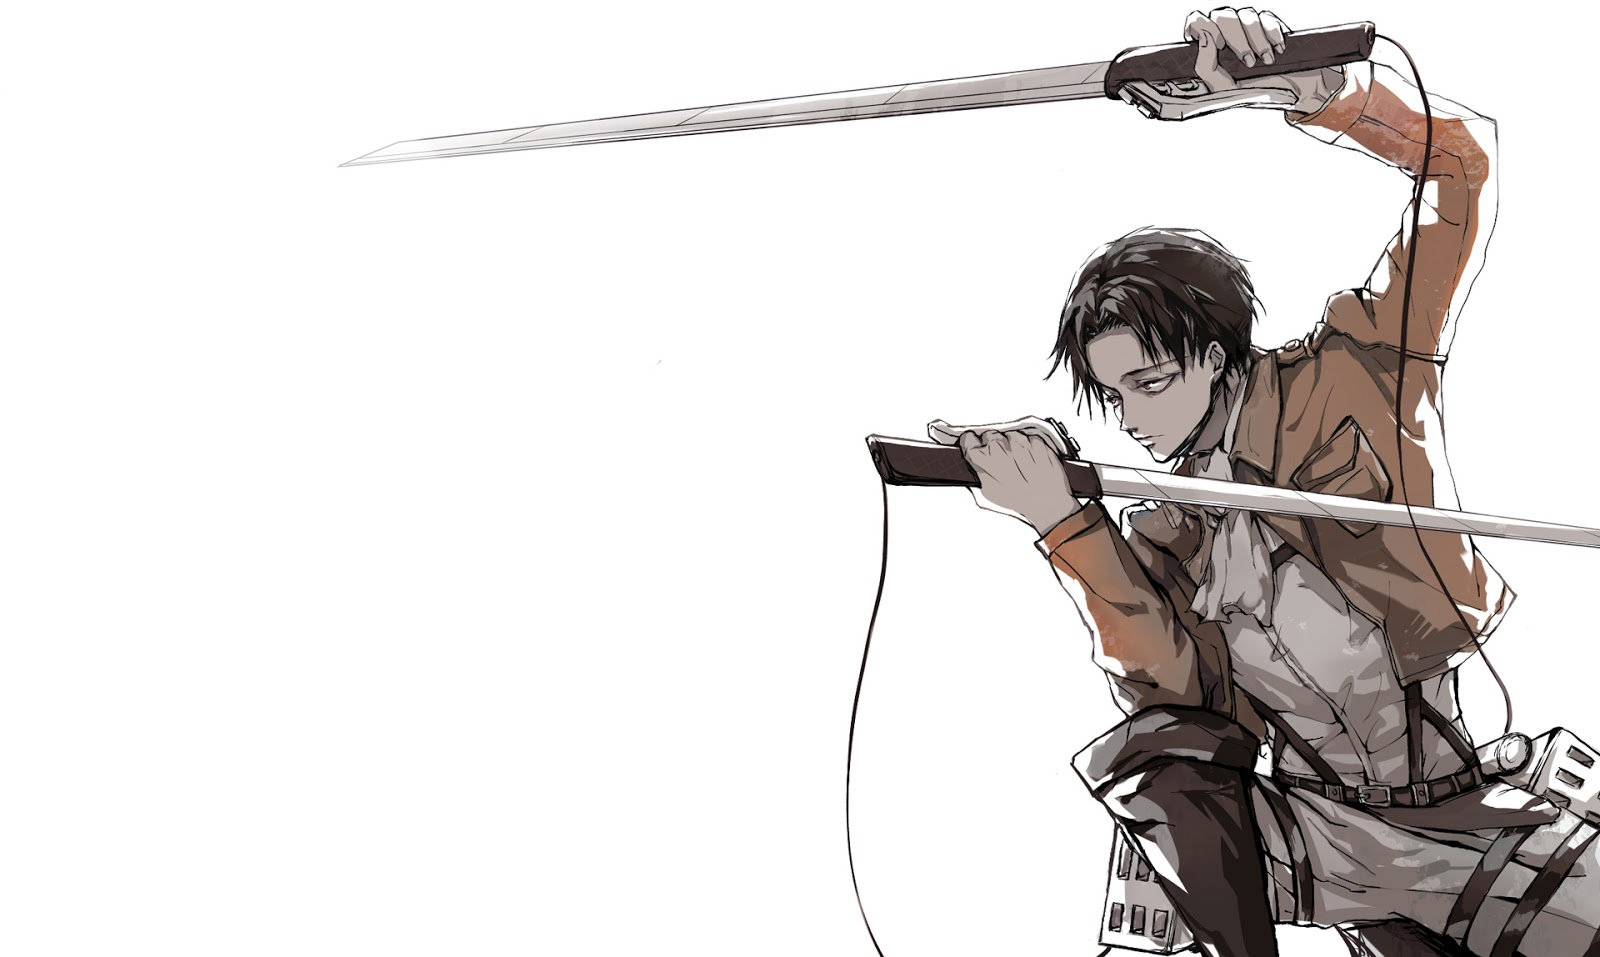 Attack on Titan Shingeki no Kyojin Levi Rivaille Anime Blade Sword HD 1600x957